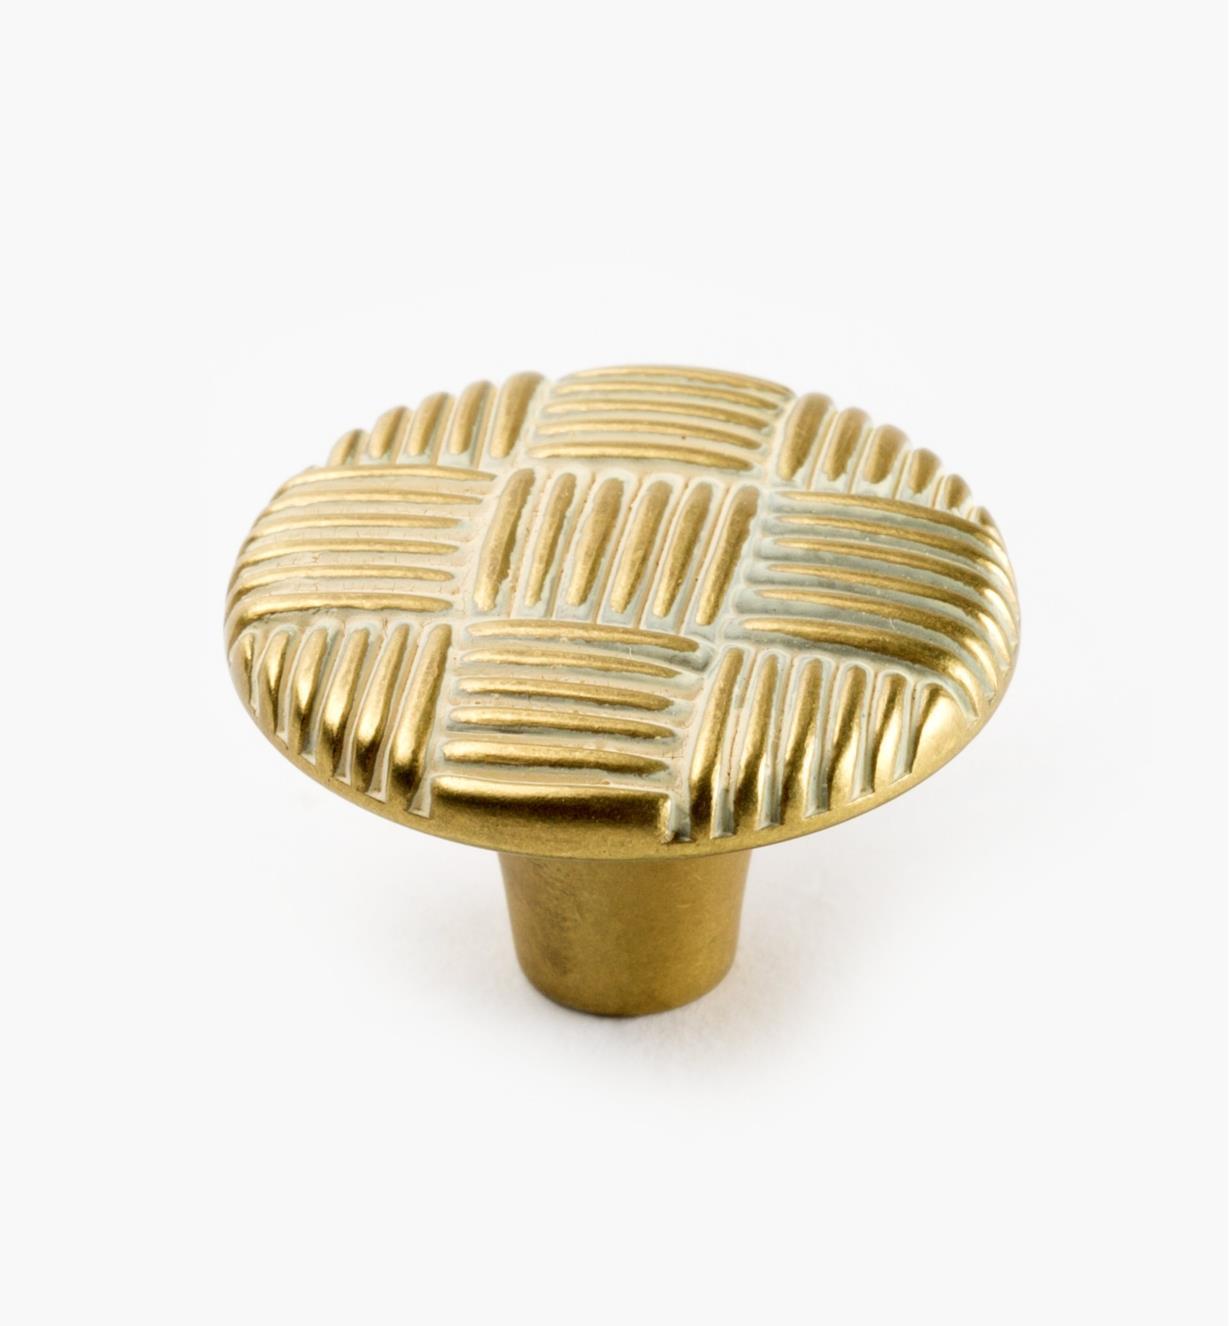 "03W1649 - Belwith Tapestry 1 1/4"" x 7/8"" Gilded Bronze Round Knob, each"